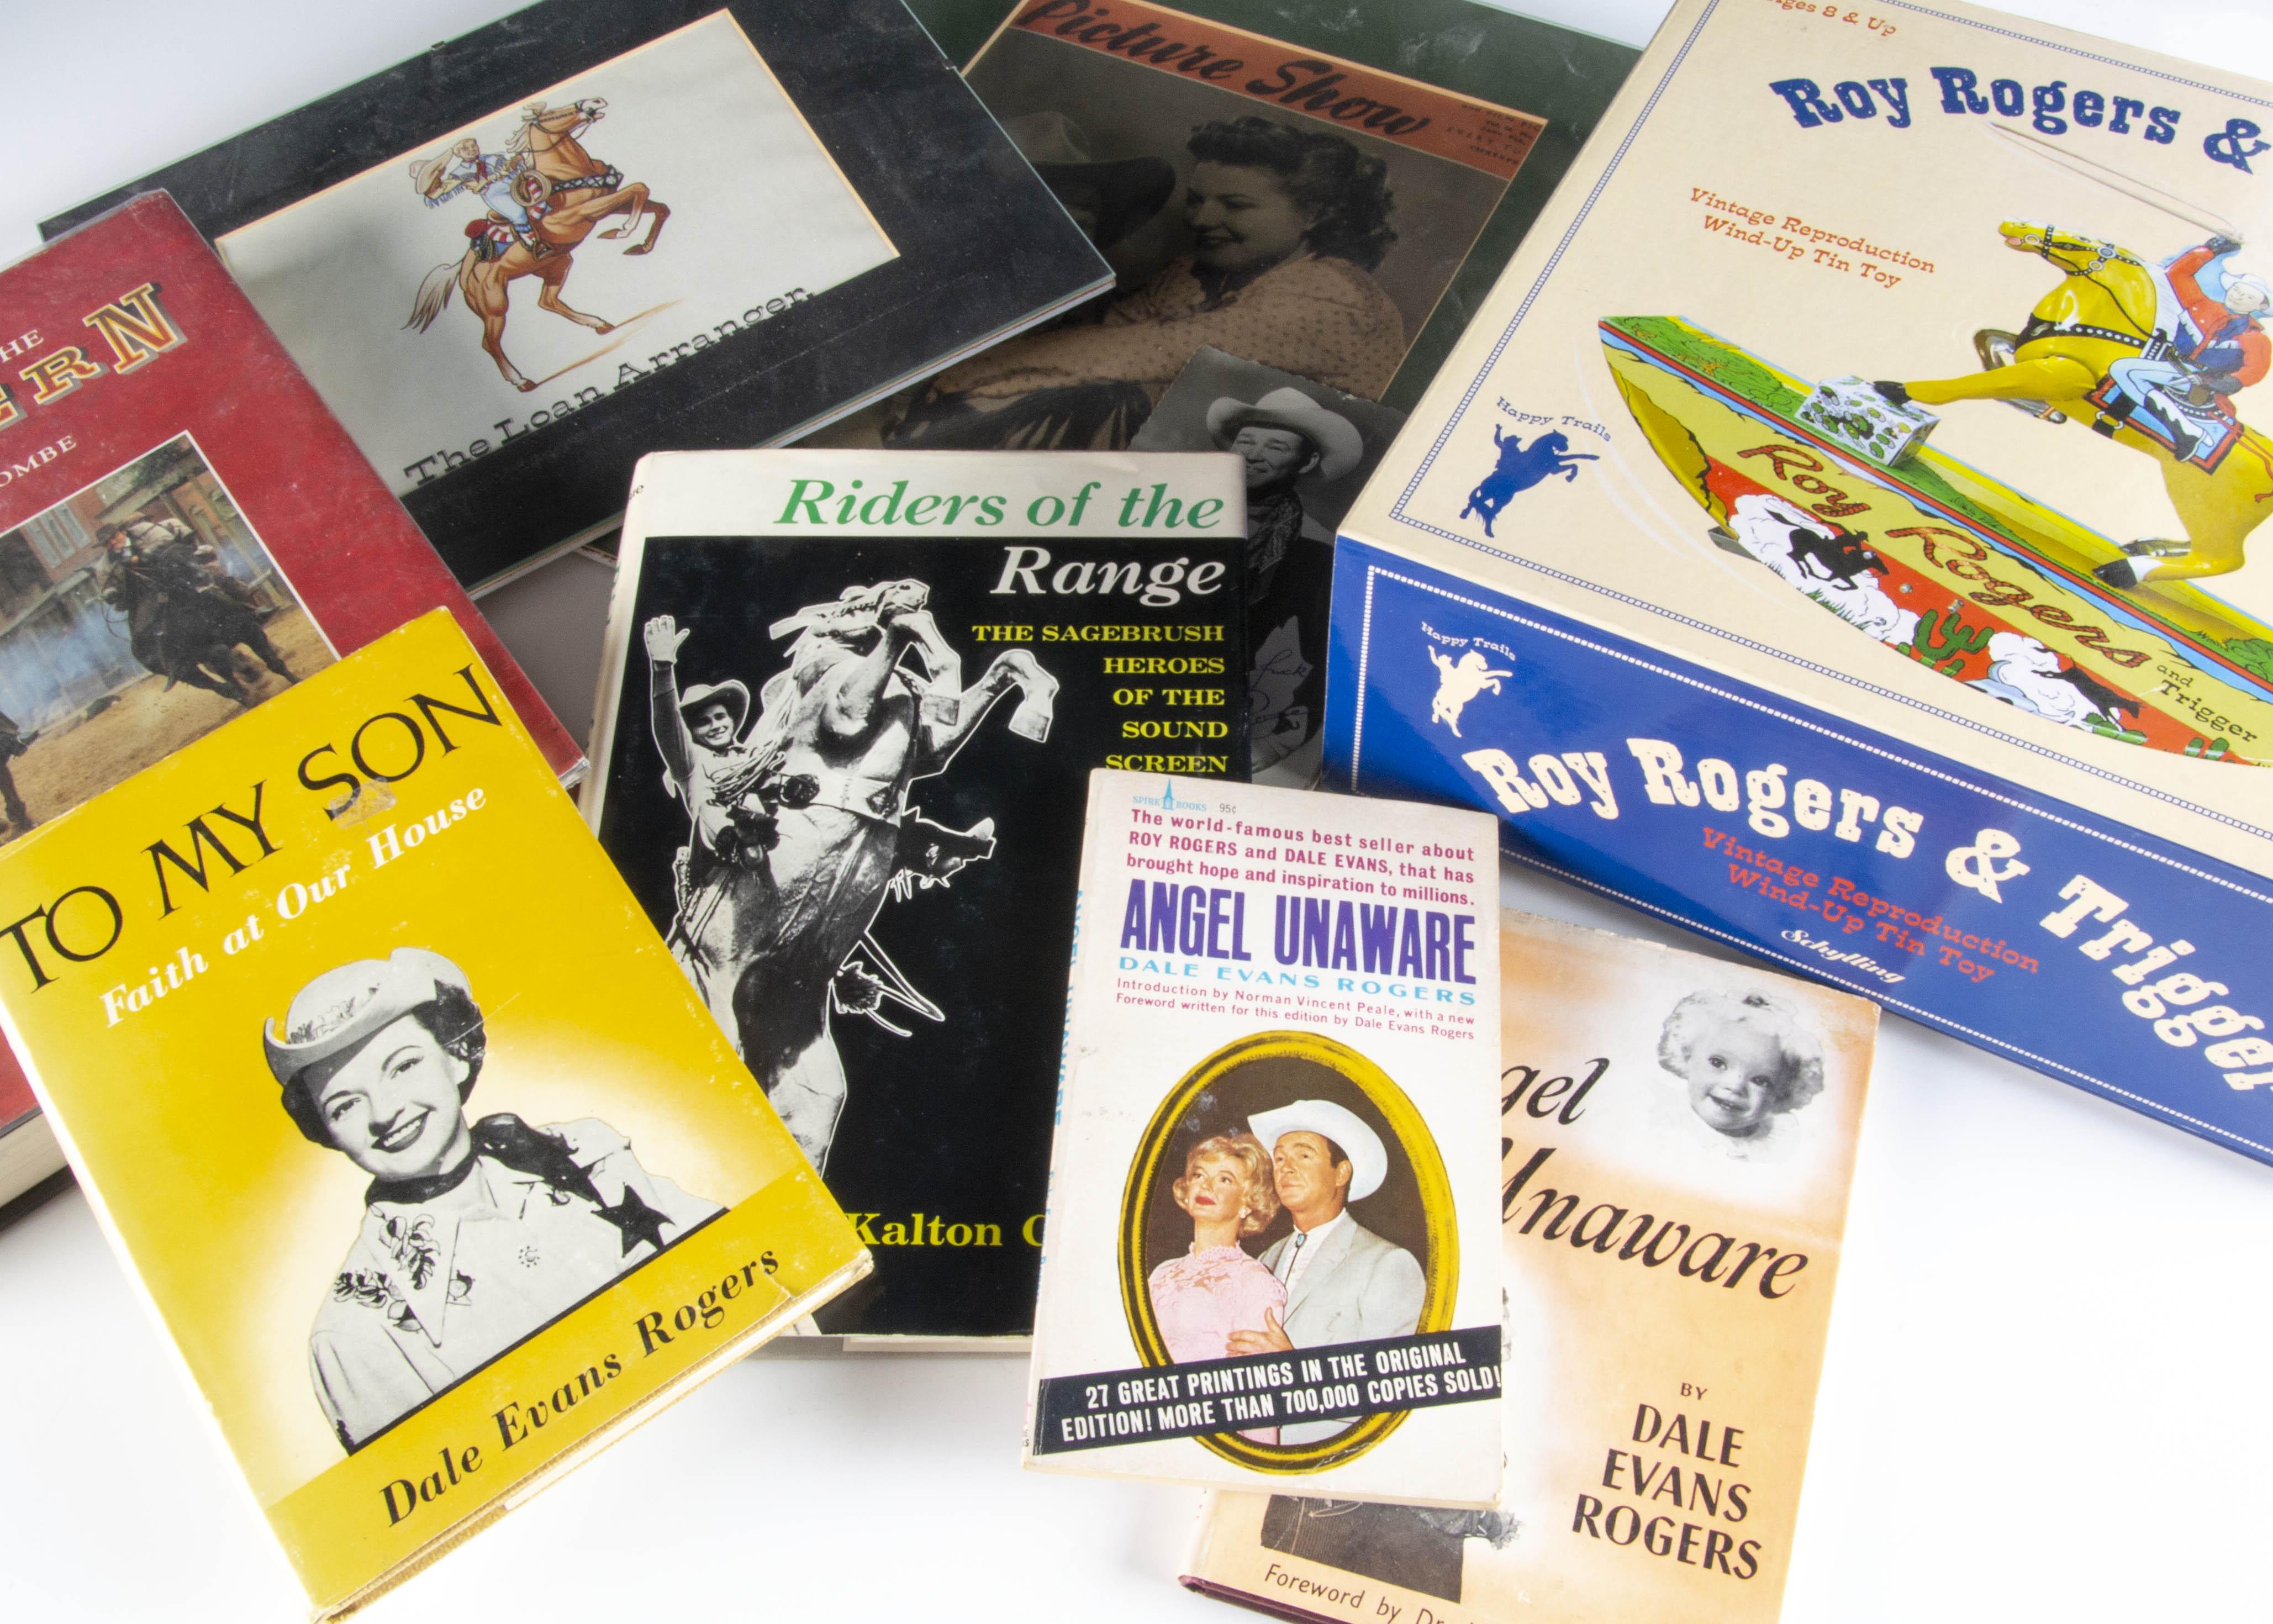 Western Films Memorabilia, a variety of Western Film memorabilia including Lone Star Western